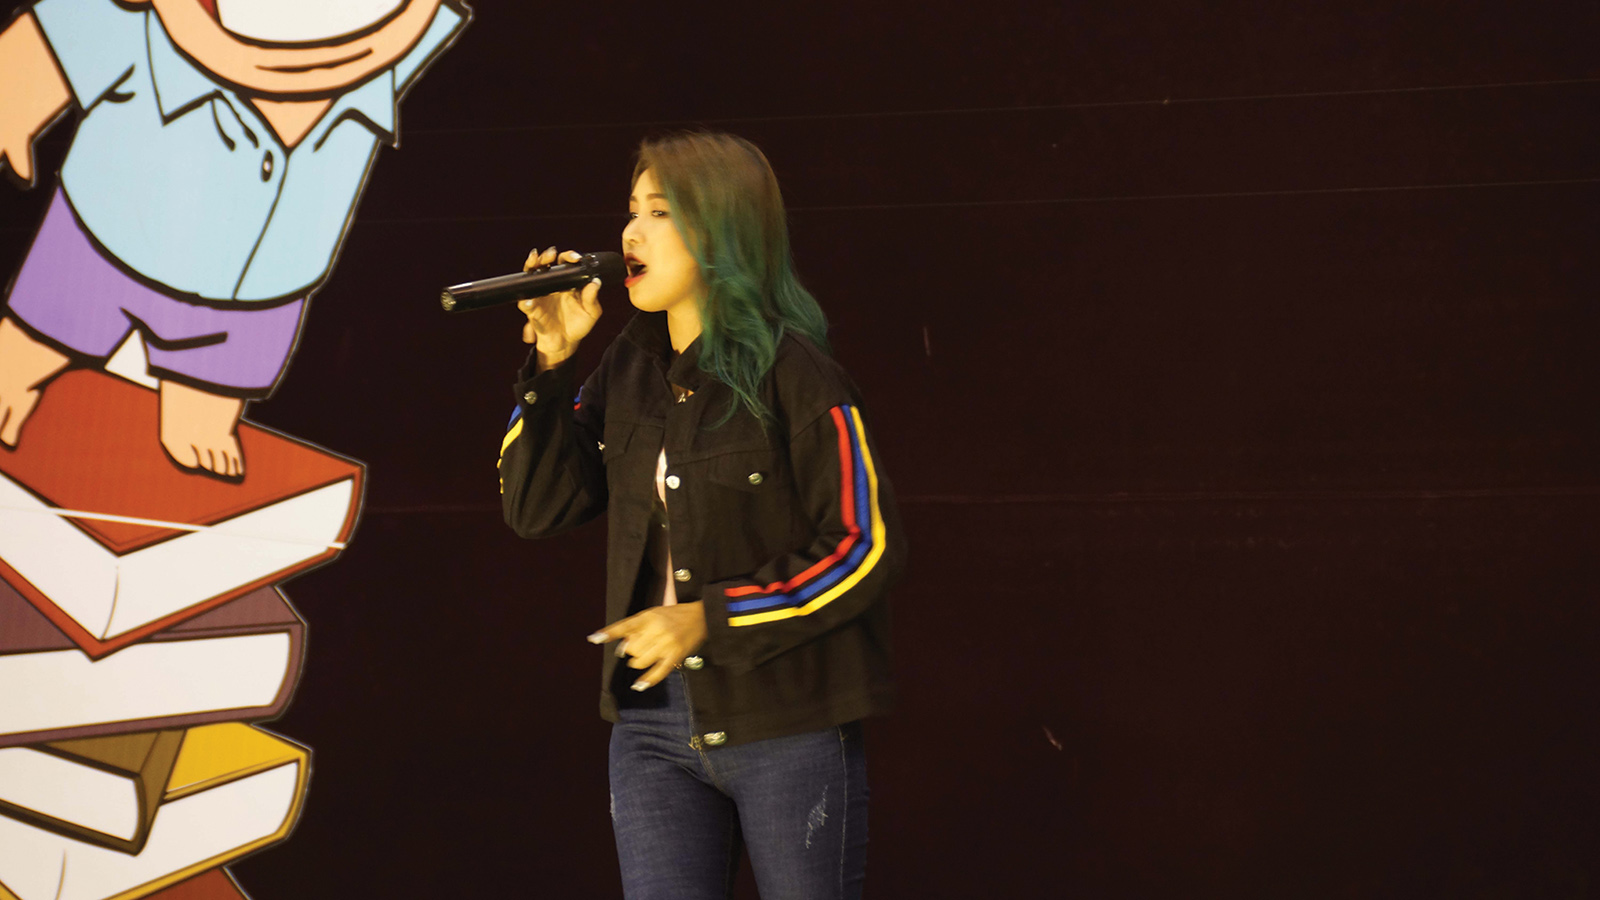 Singer Mi Sandi entertains with songs at the festvial.